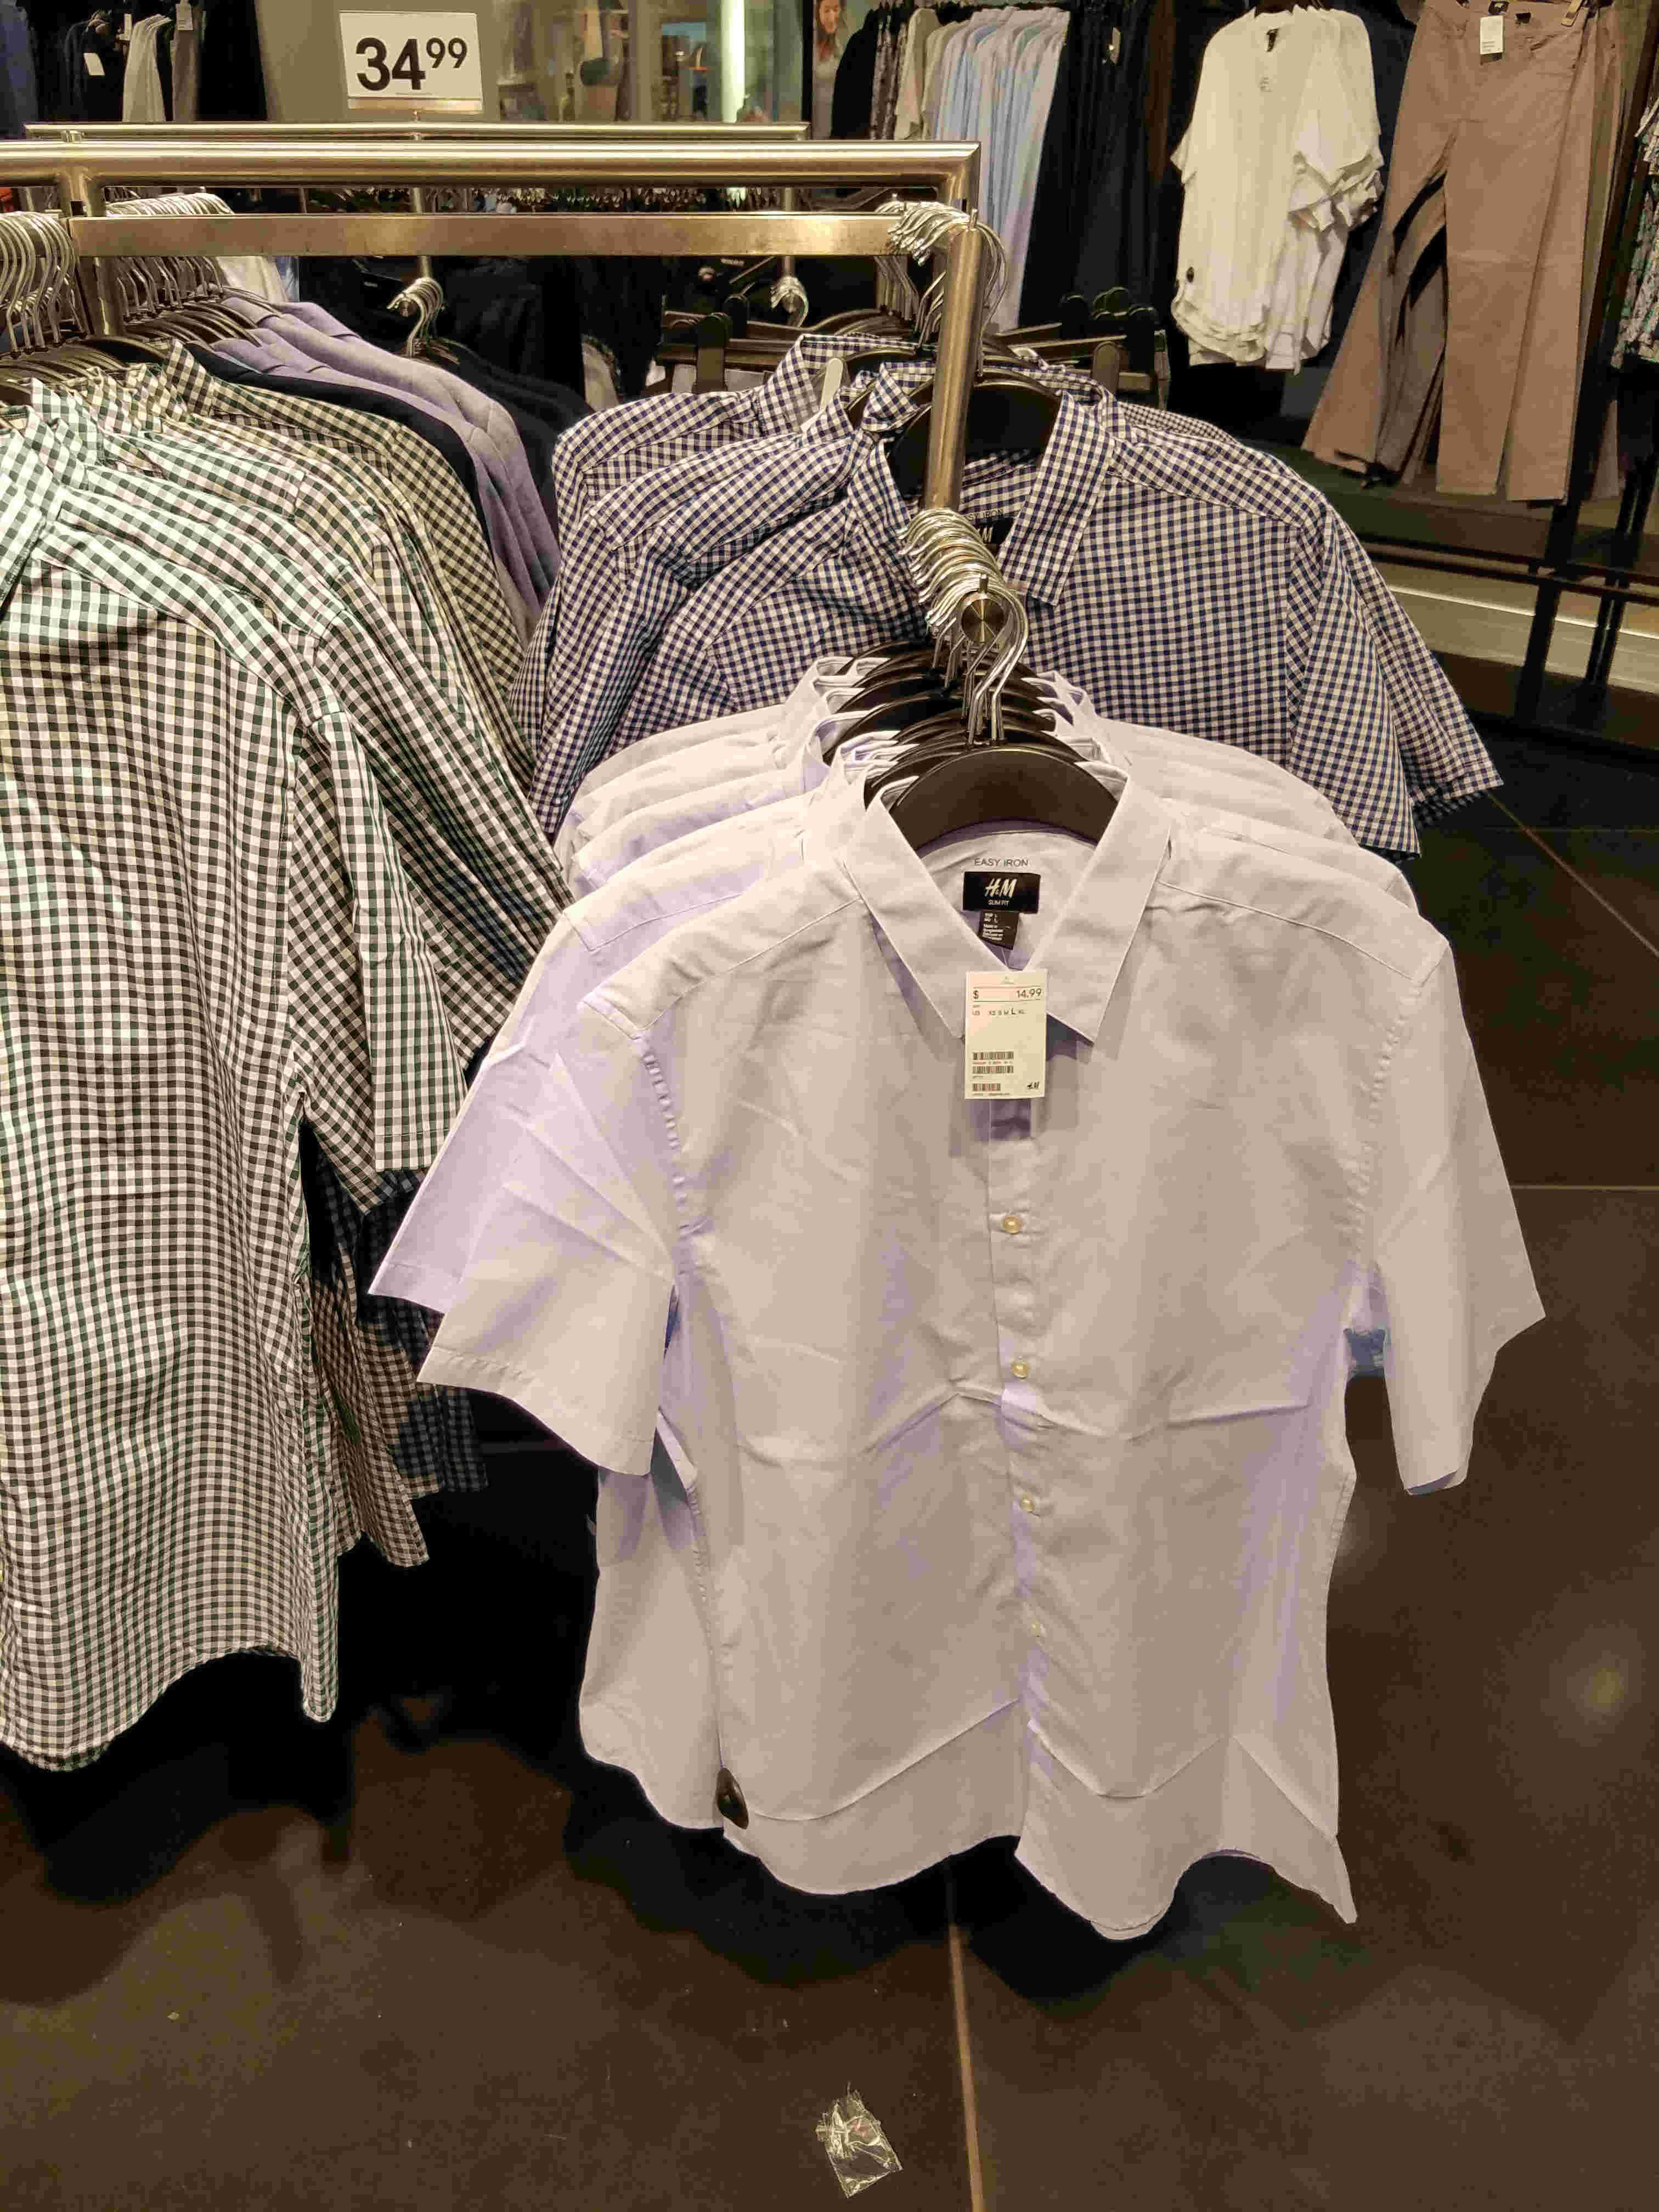 Summer Style For Short Men: Shirts At H&M | ShortGuyCentral